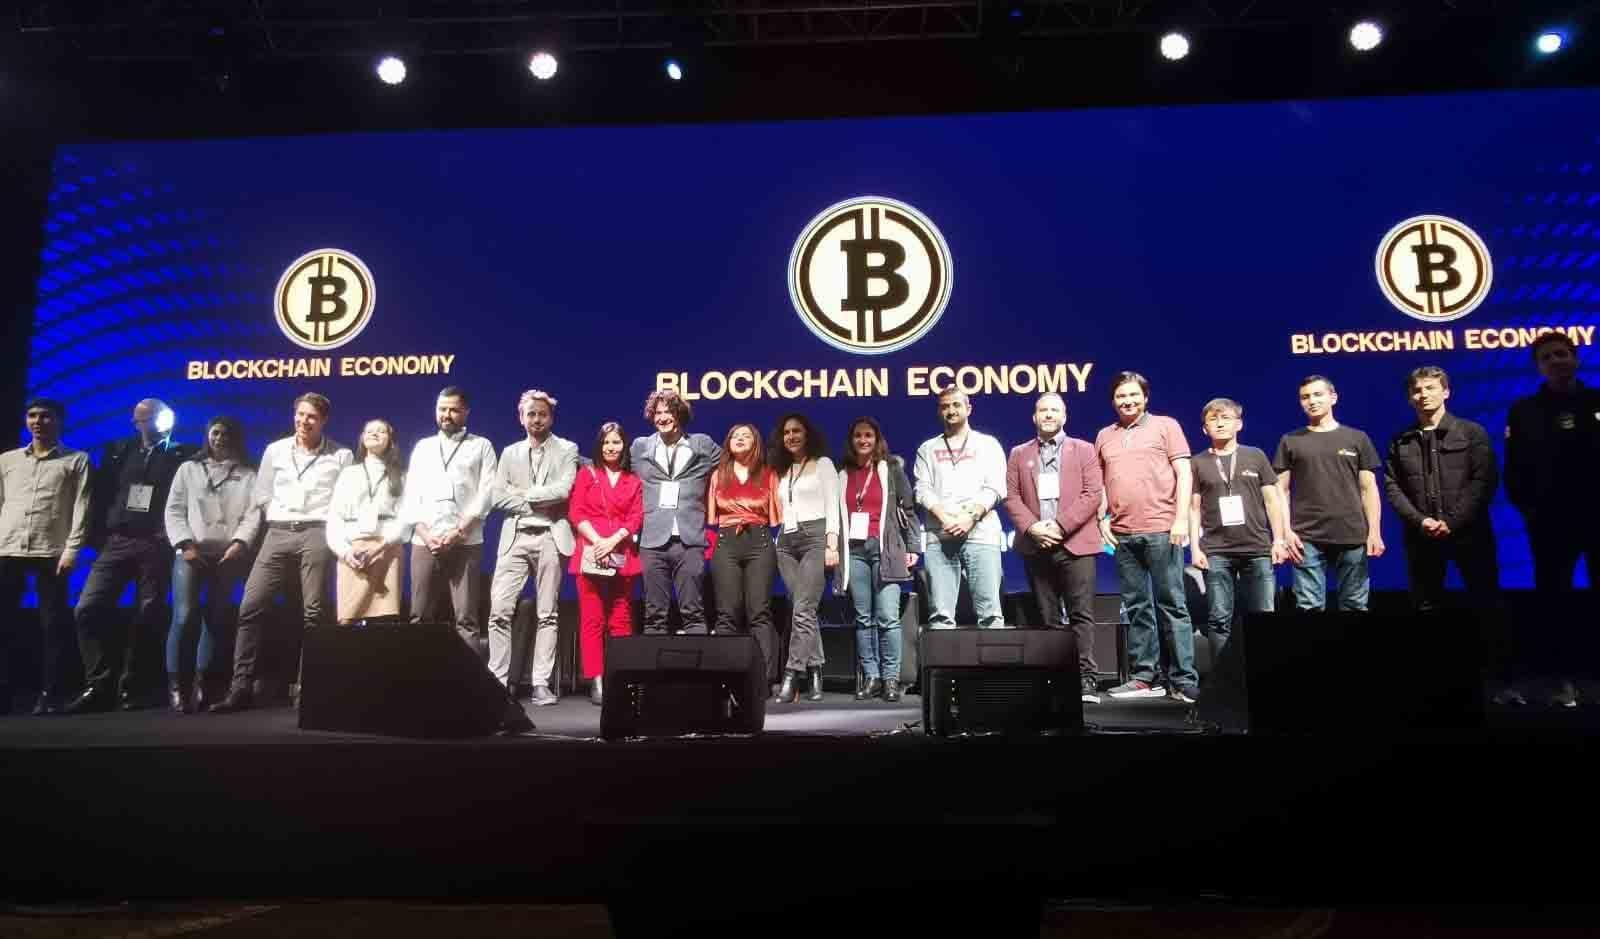 Blockchain Economy - Istambul Turki